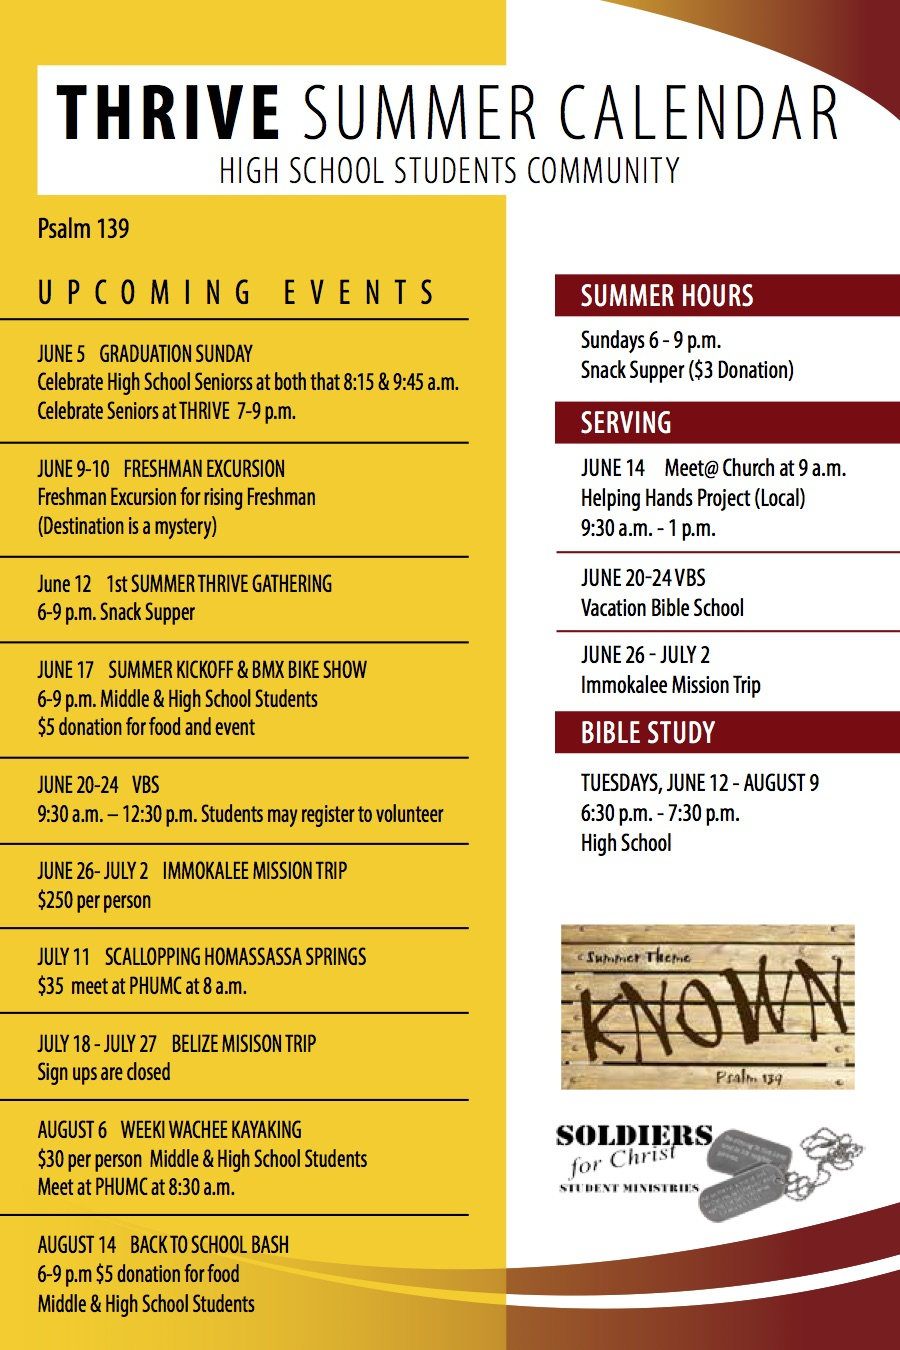 Church-Summer-Camp-Calendar-Sample - Wilson Printing Usa